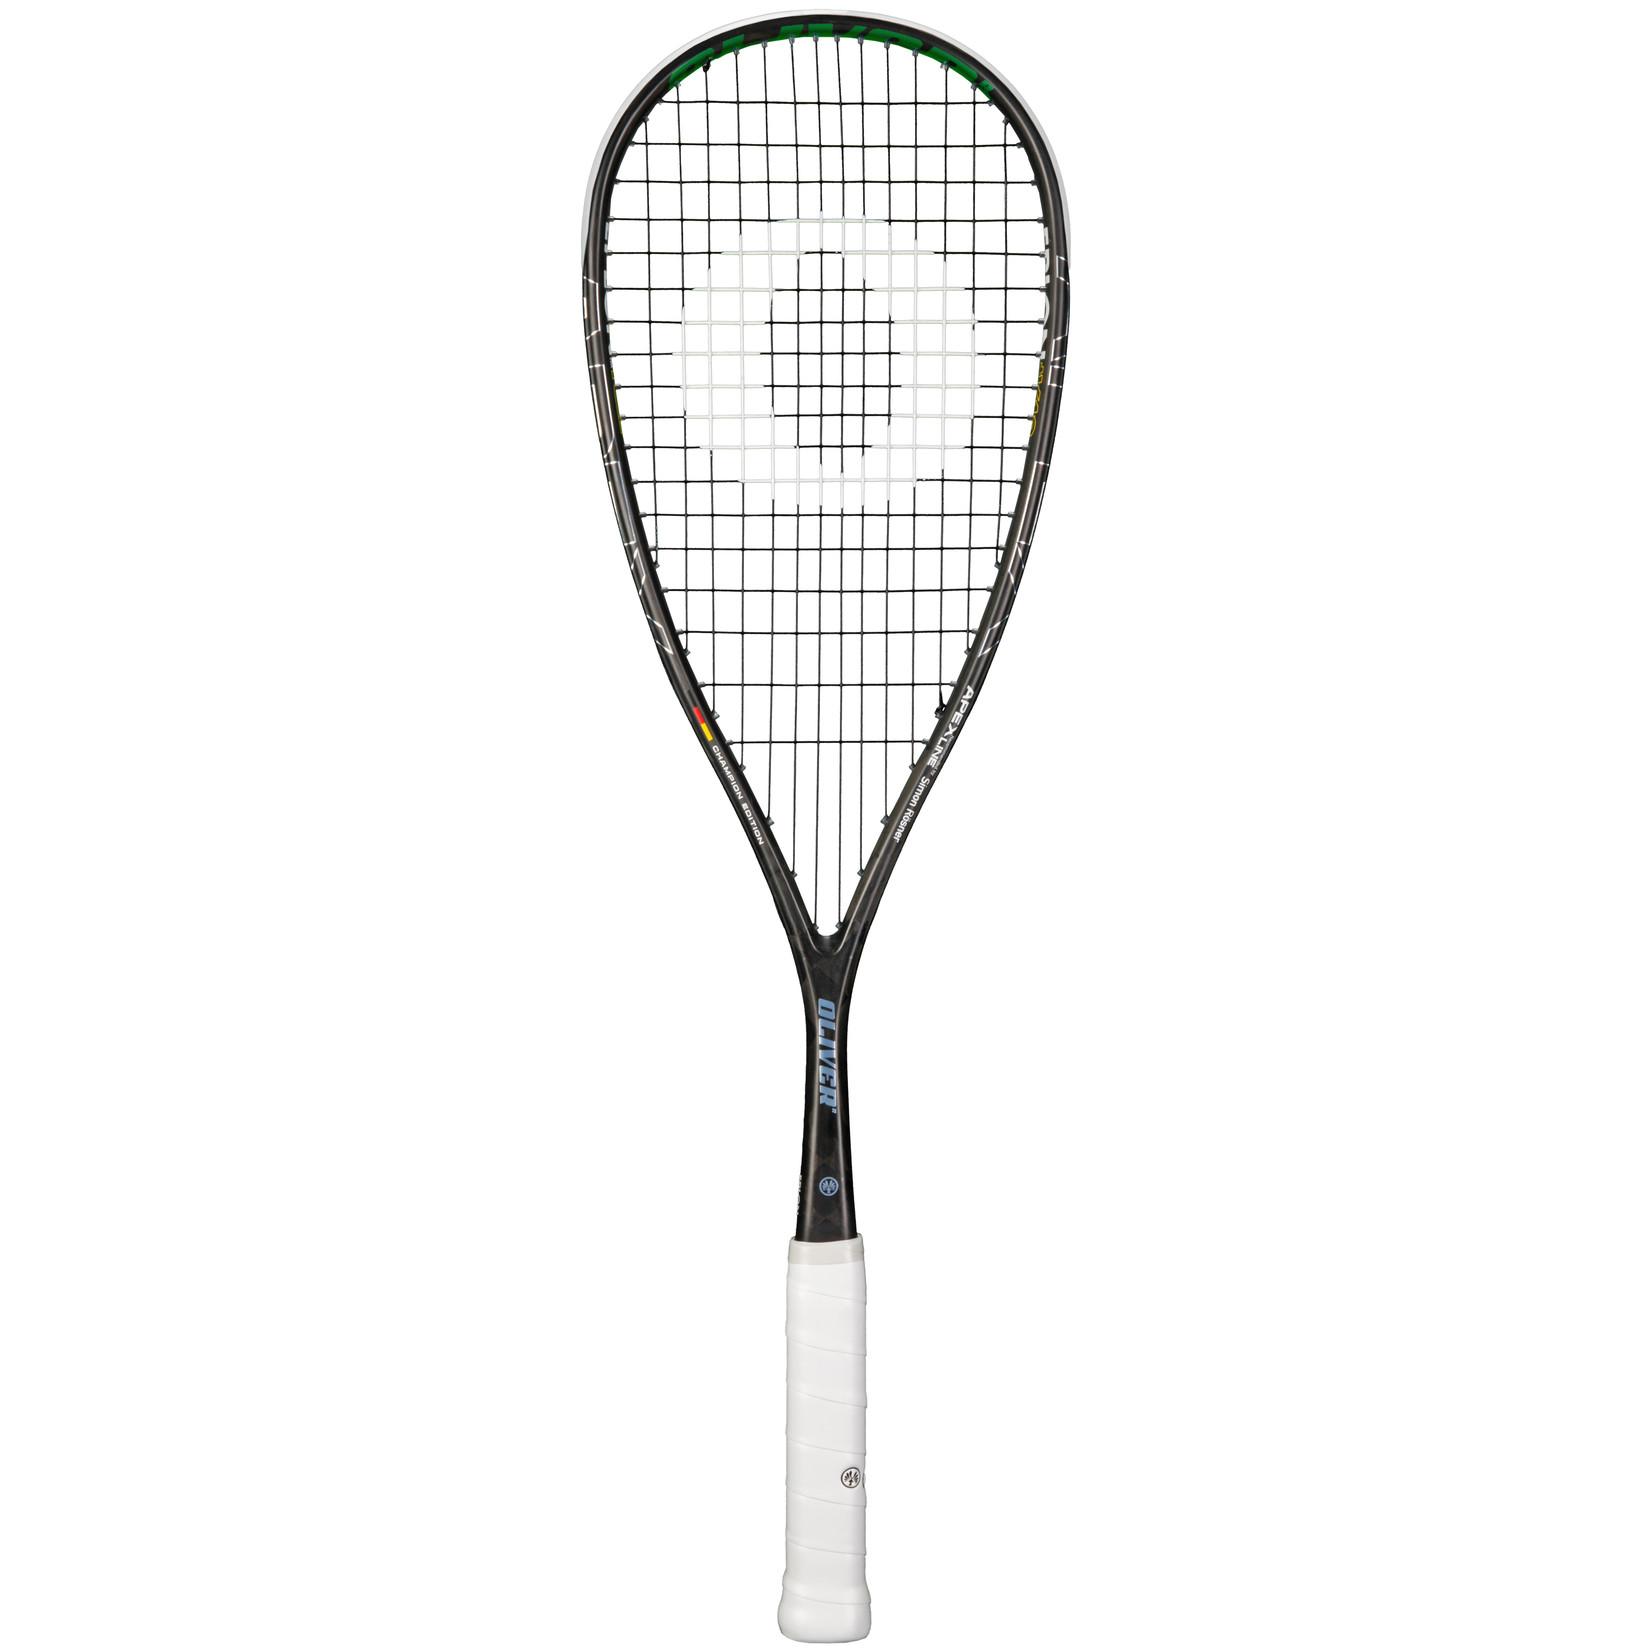 Oliver Apex 900 squashracket